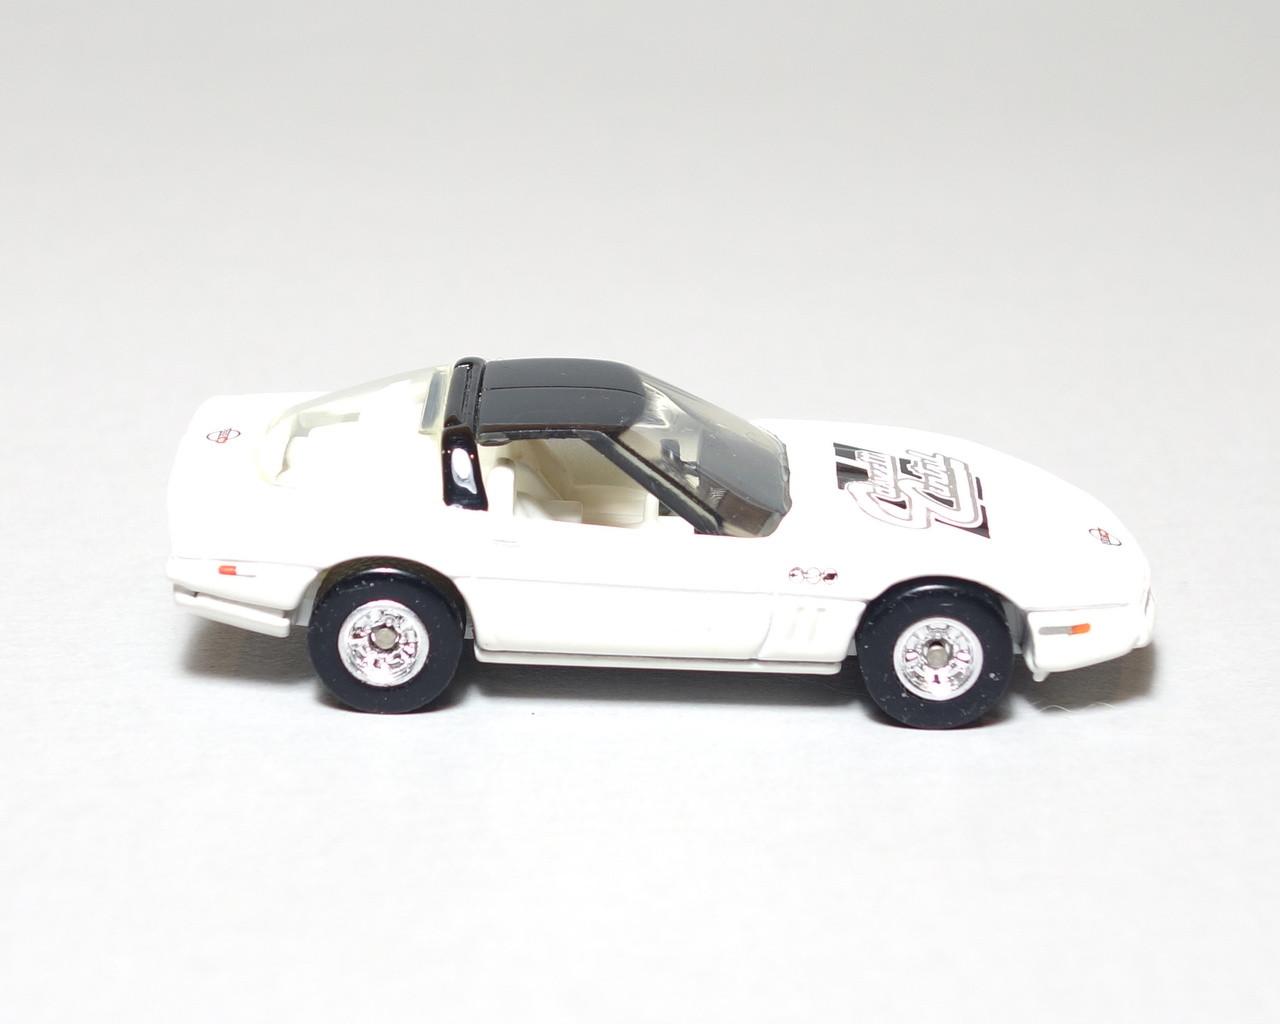 Hot Wheels 1988 35th Anniversary Edition Corvette in White Limited Edition for Corvette Central